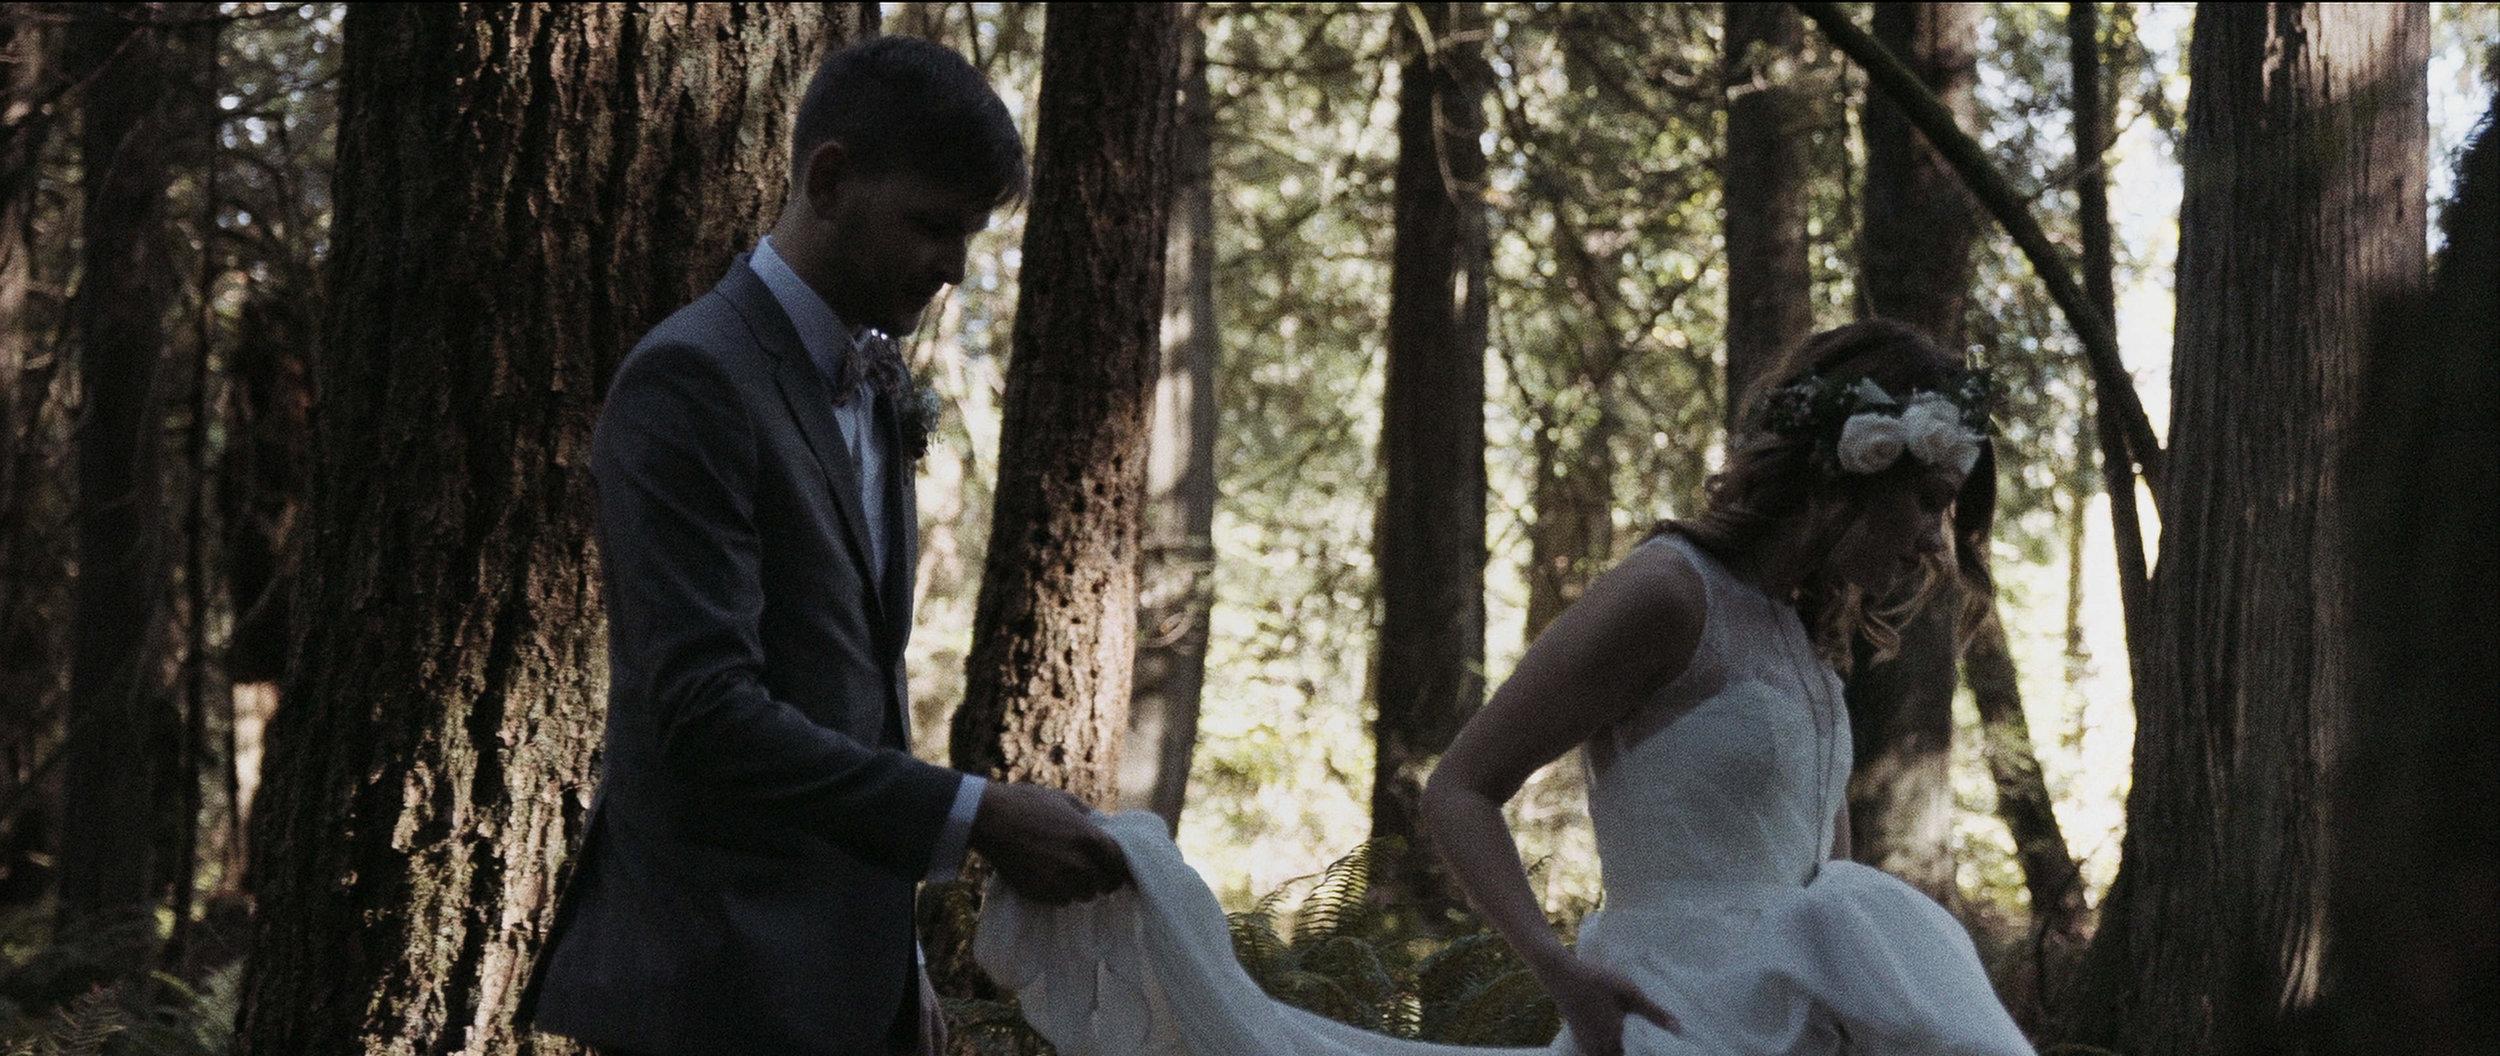 vancouver-wedding-videography197.jpg